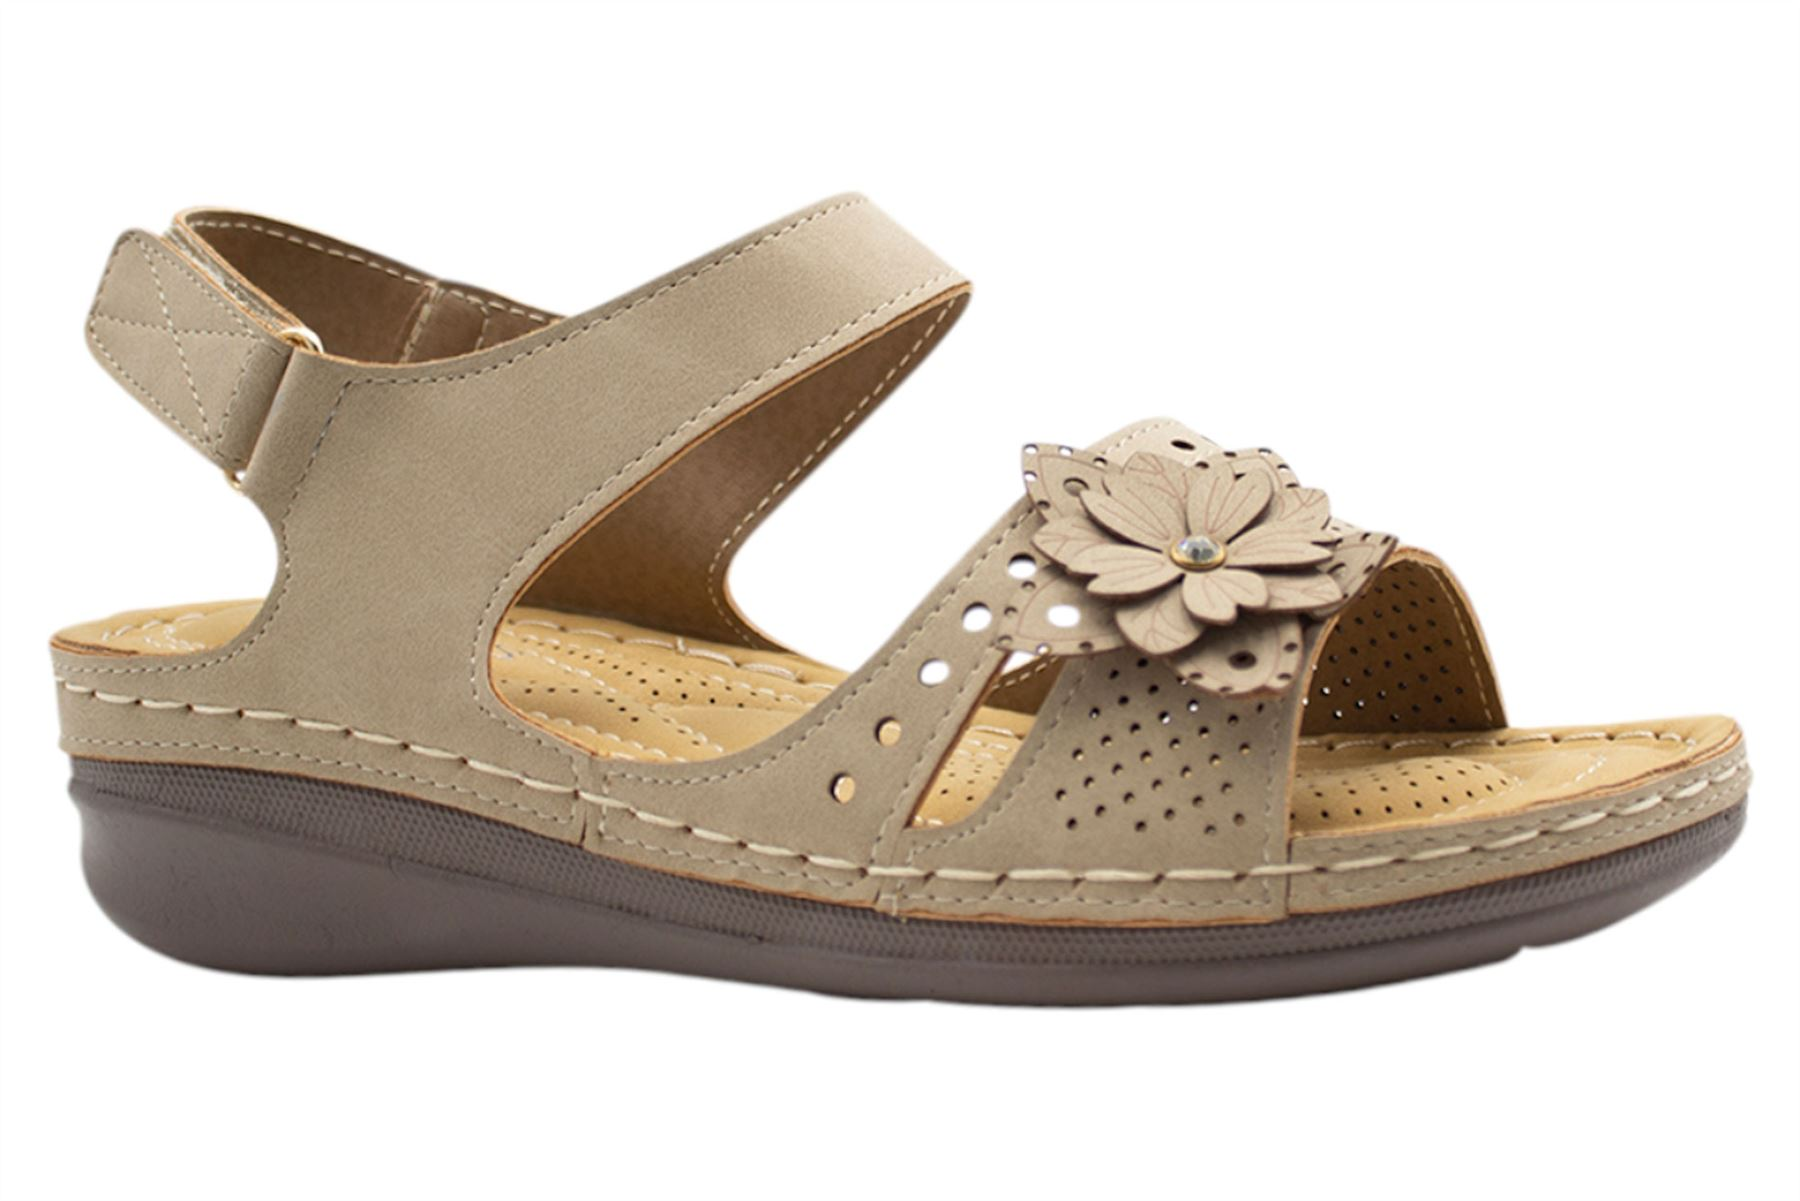 Ladies-Wedge-Heel-Sandal-Womens-Comfort-Cushion-Strapy-Summer-Shoes miniatura 6